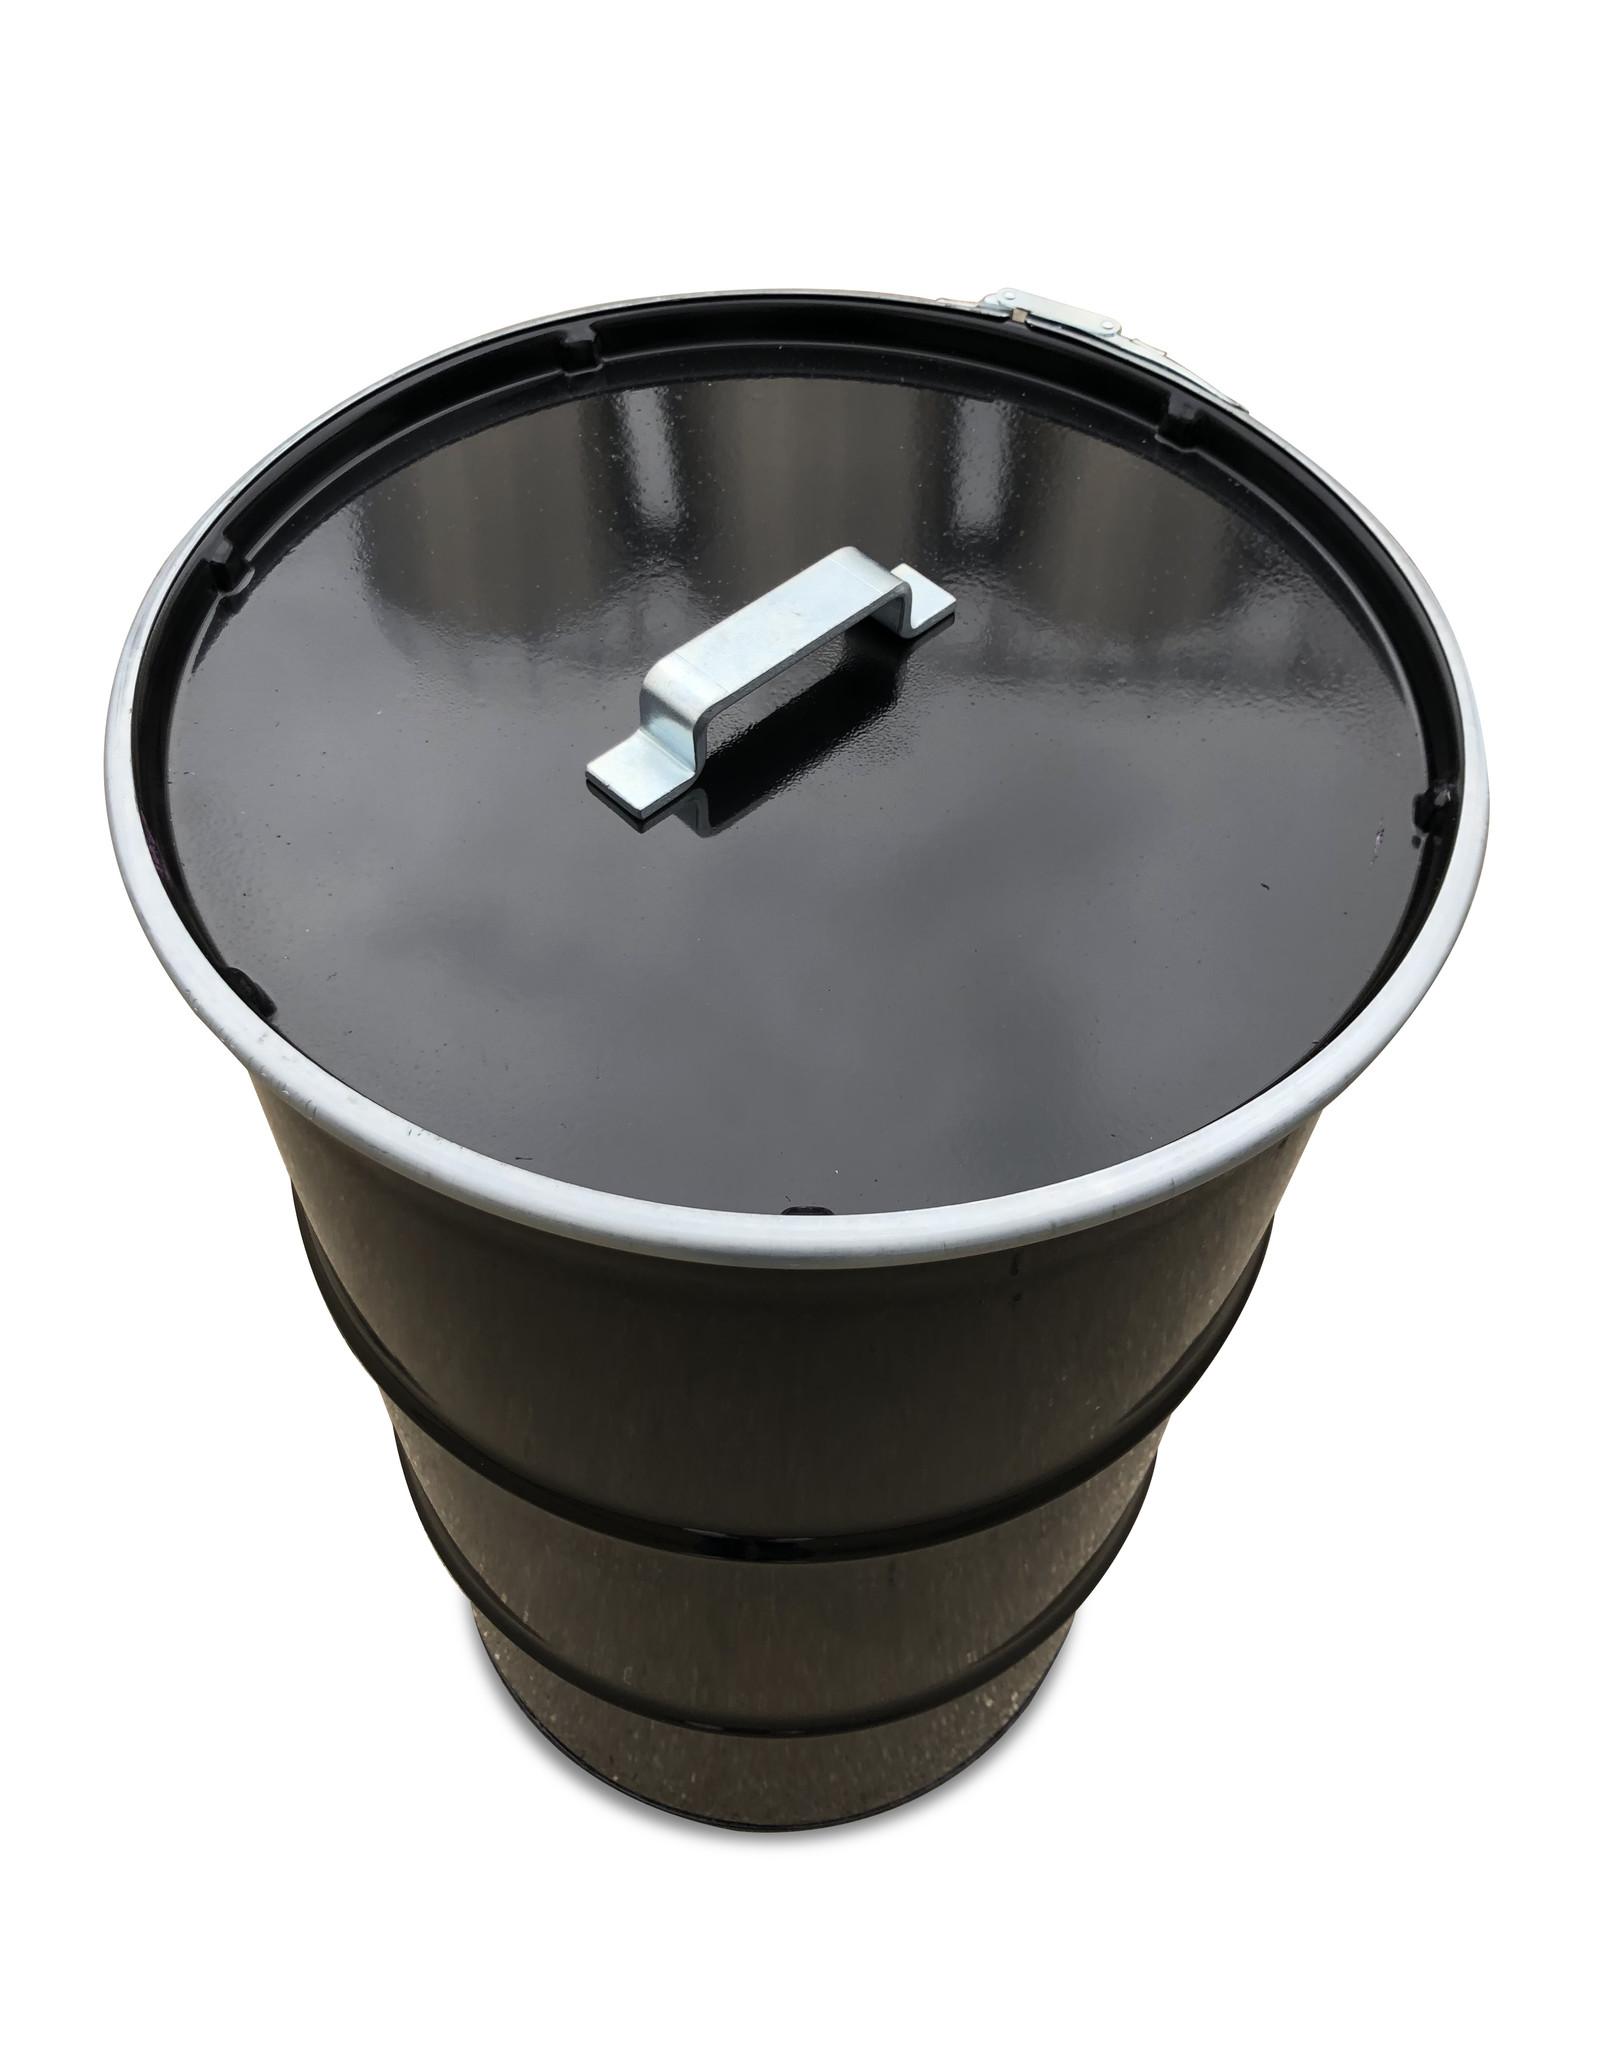 The Binbin BinBin Handle zwart- prullenbak 120 Liter  met deksel en handvat